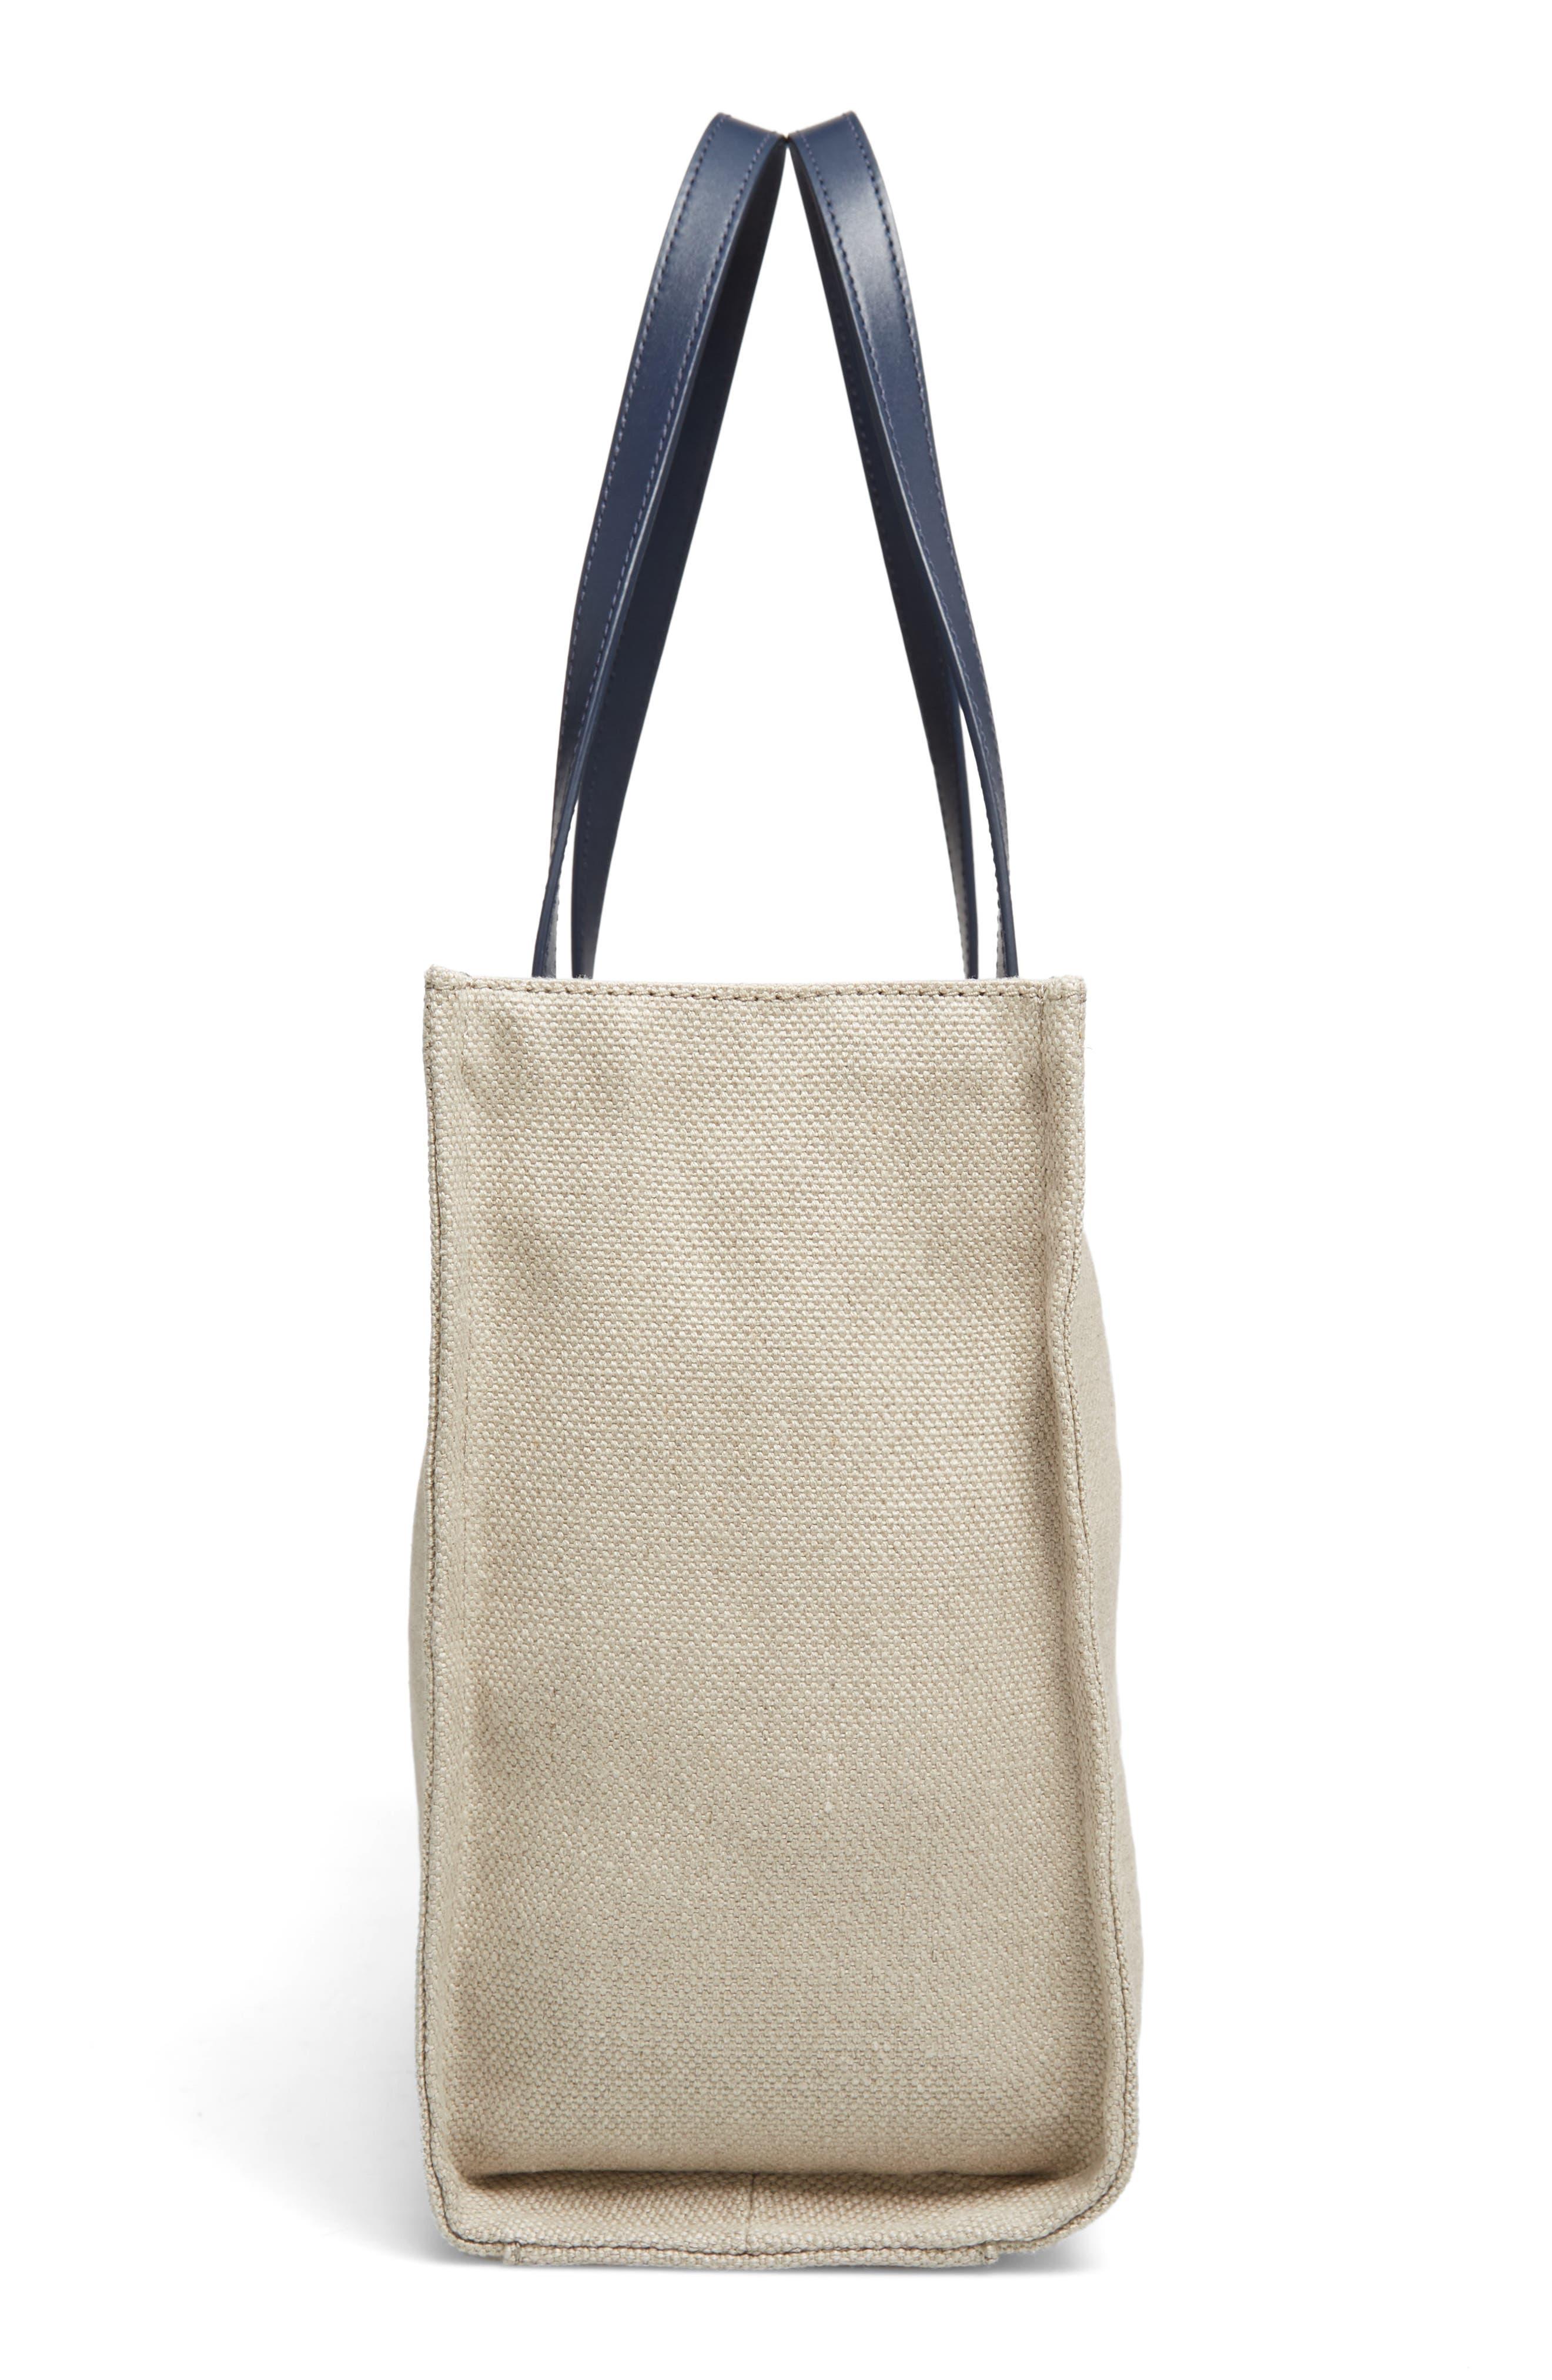 washington square - mega sam canvas satchel,                             Alternate thumbnail 5, color,                             Natural Linen/Bubble Gum/Navy